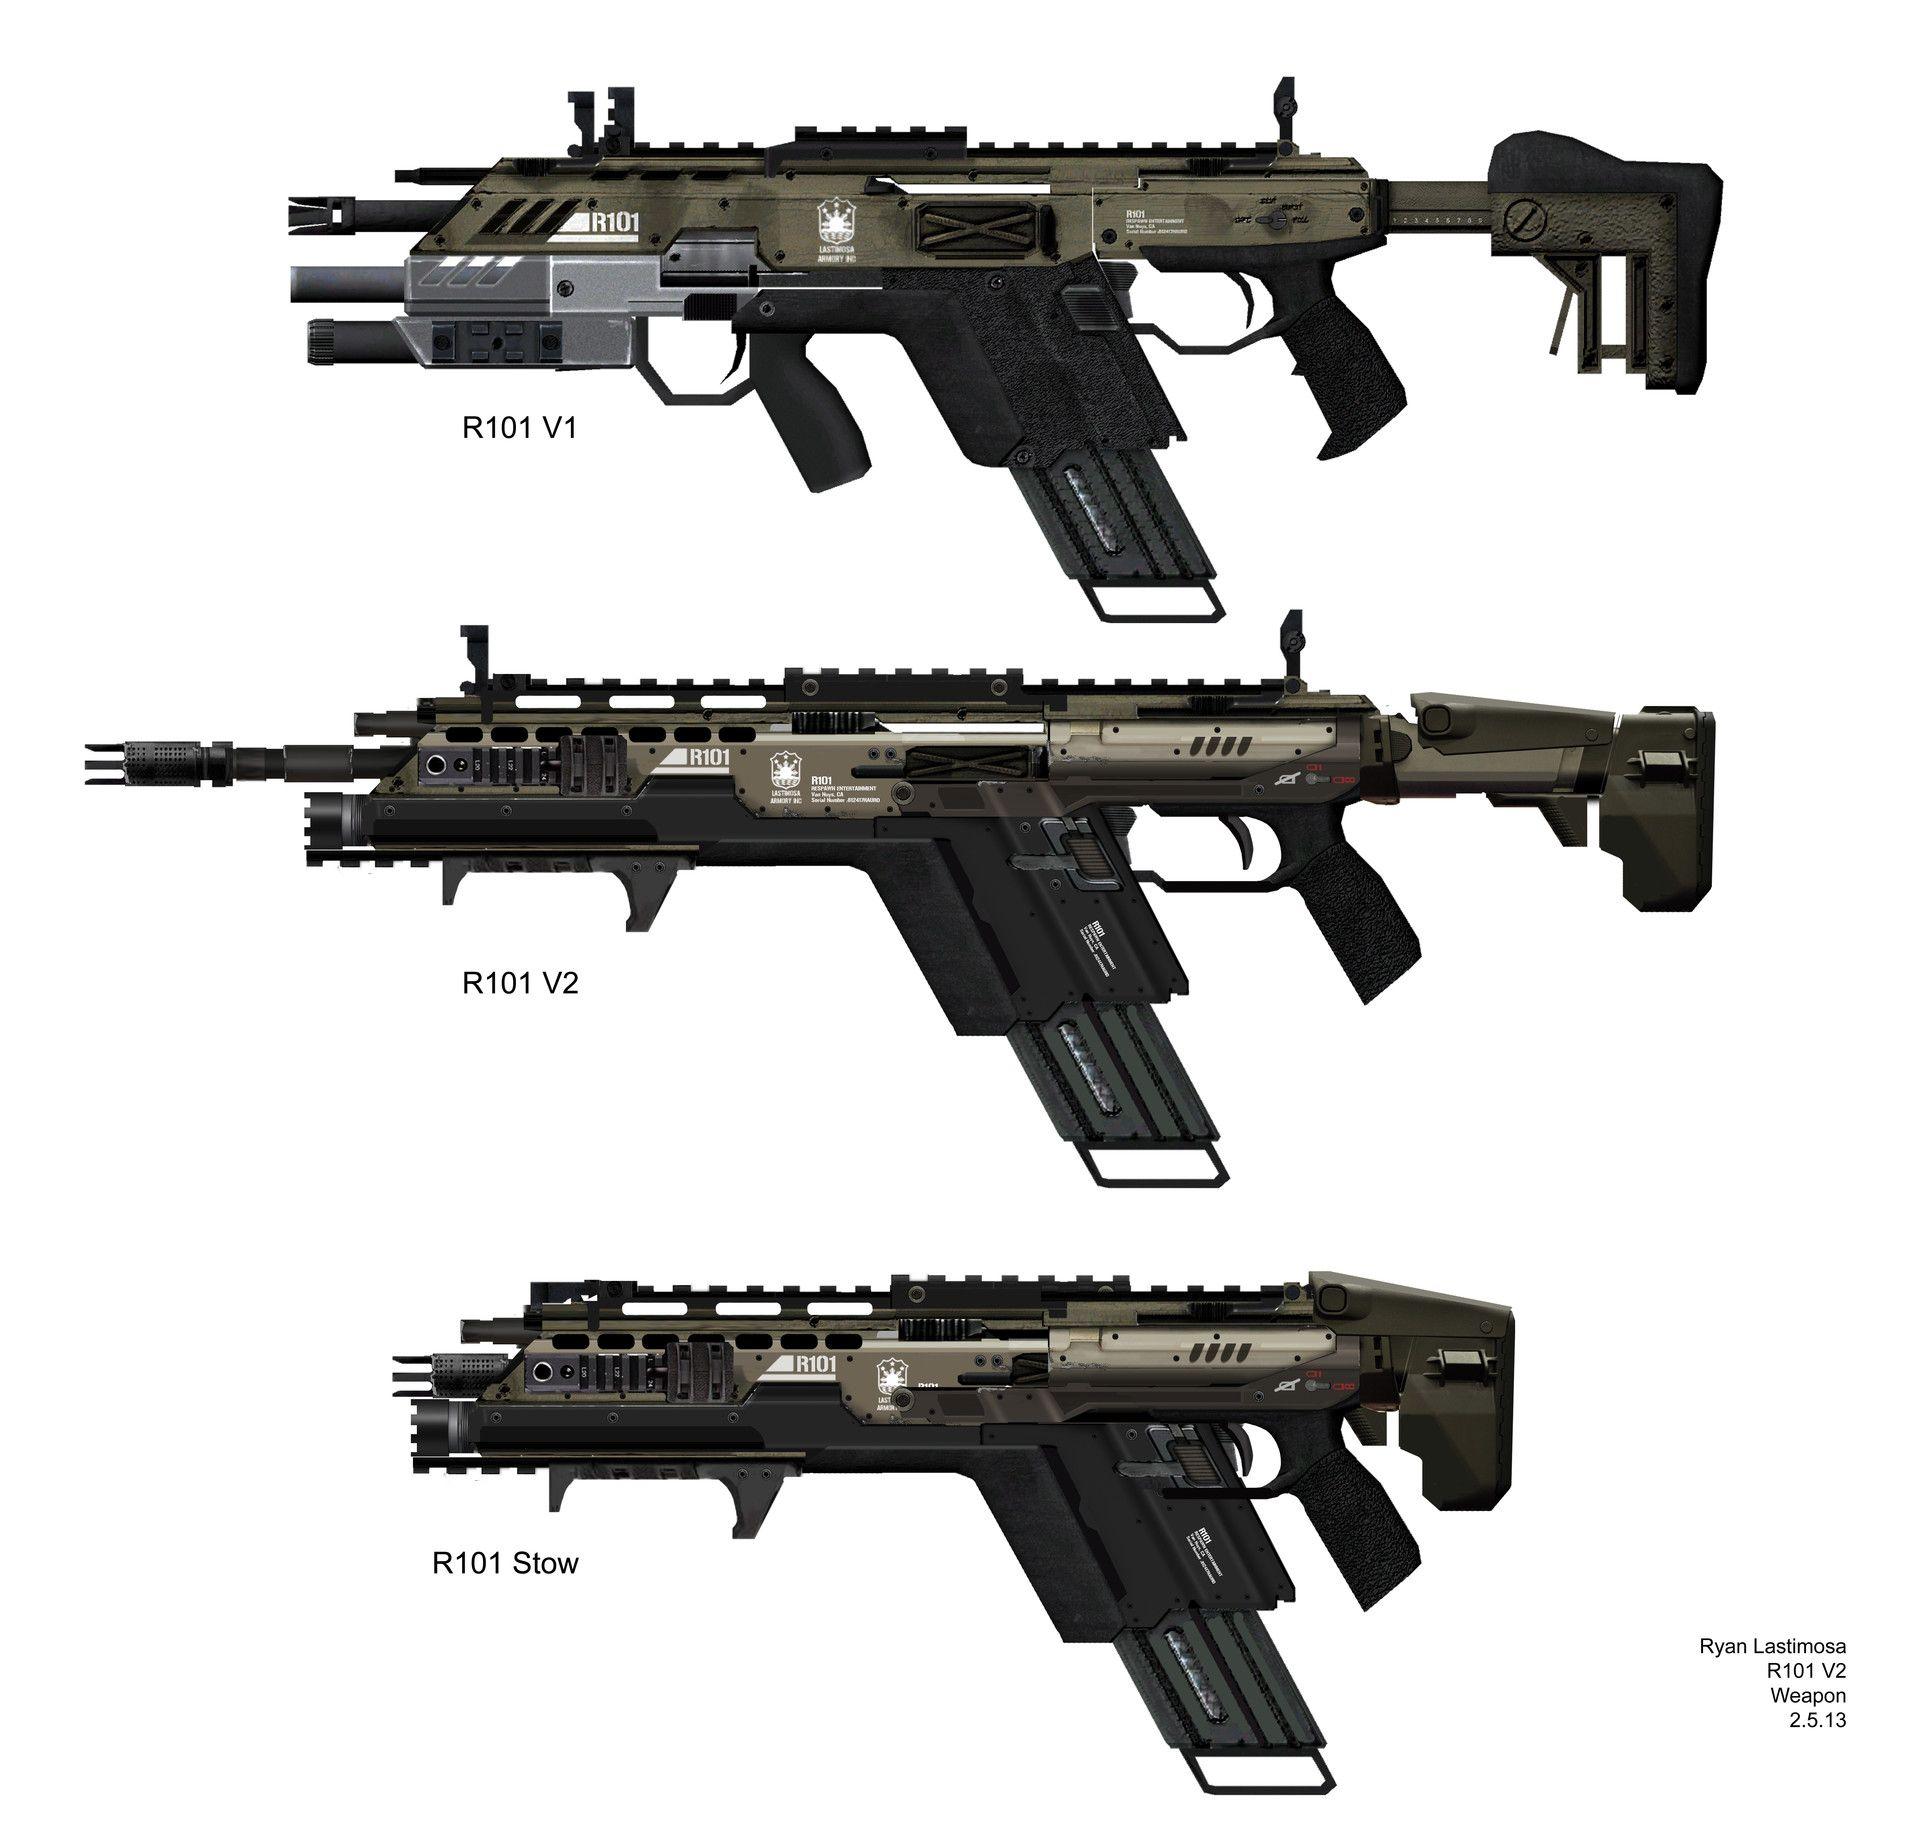 titanfall 1 r101c assault rifle by ryan lastimosa on